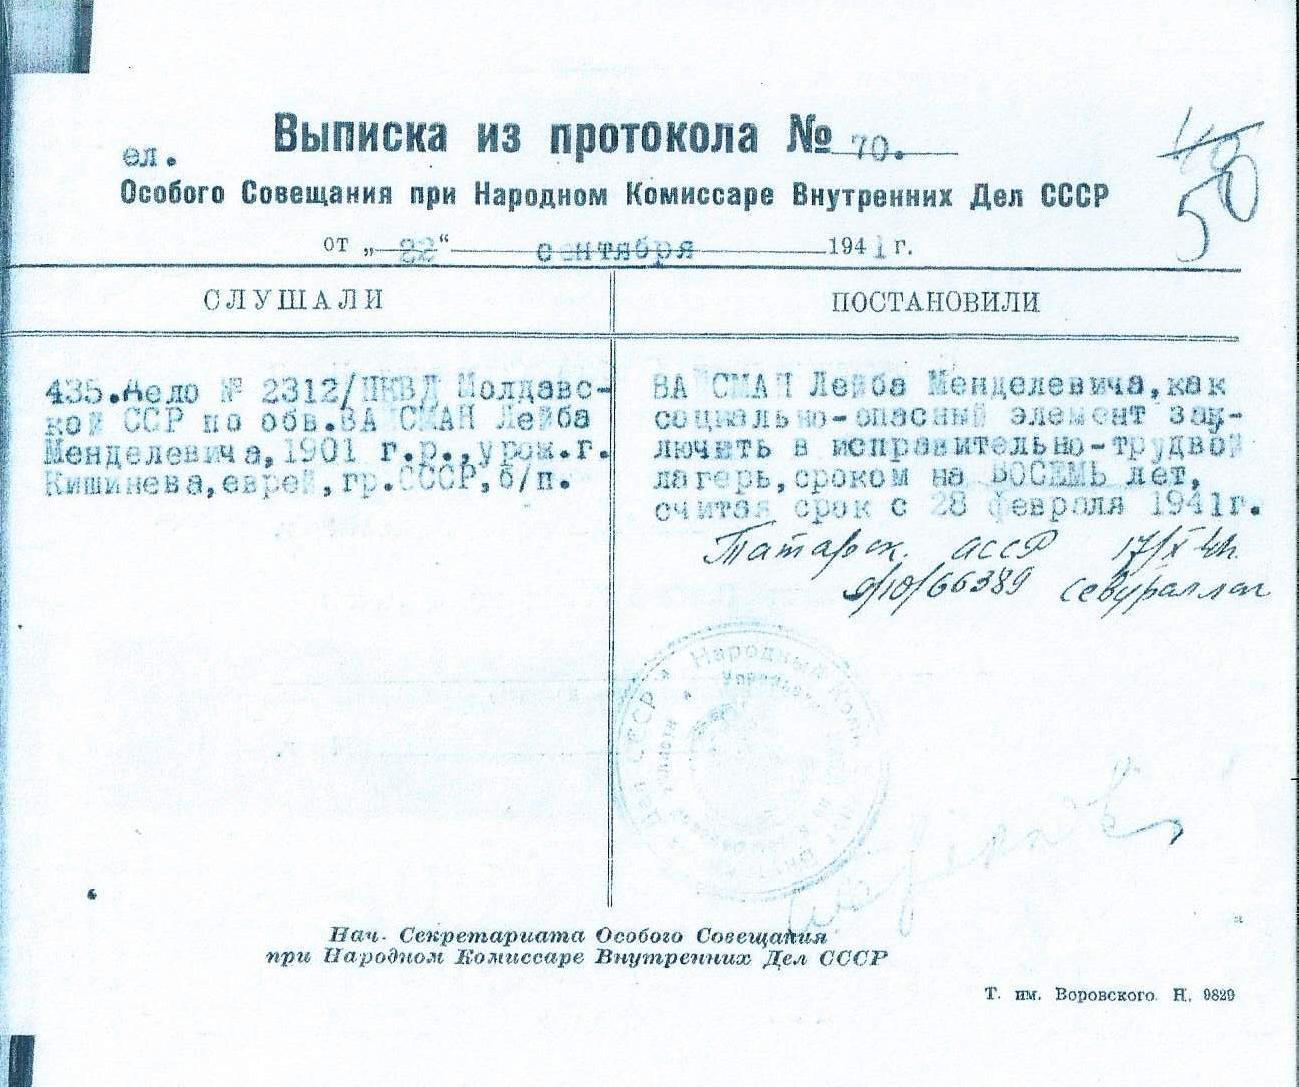 C:\Users\Ella Romm\Documents\Lev Vaysman (2).jpg